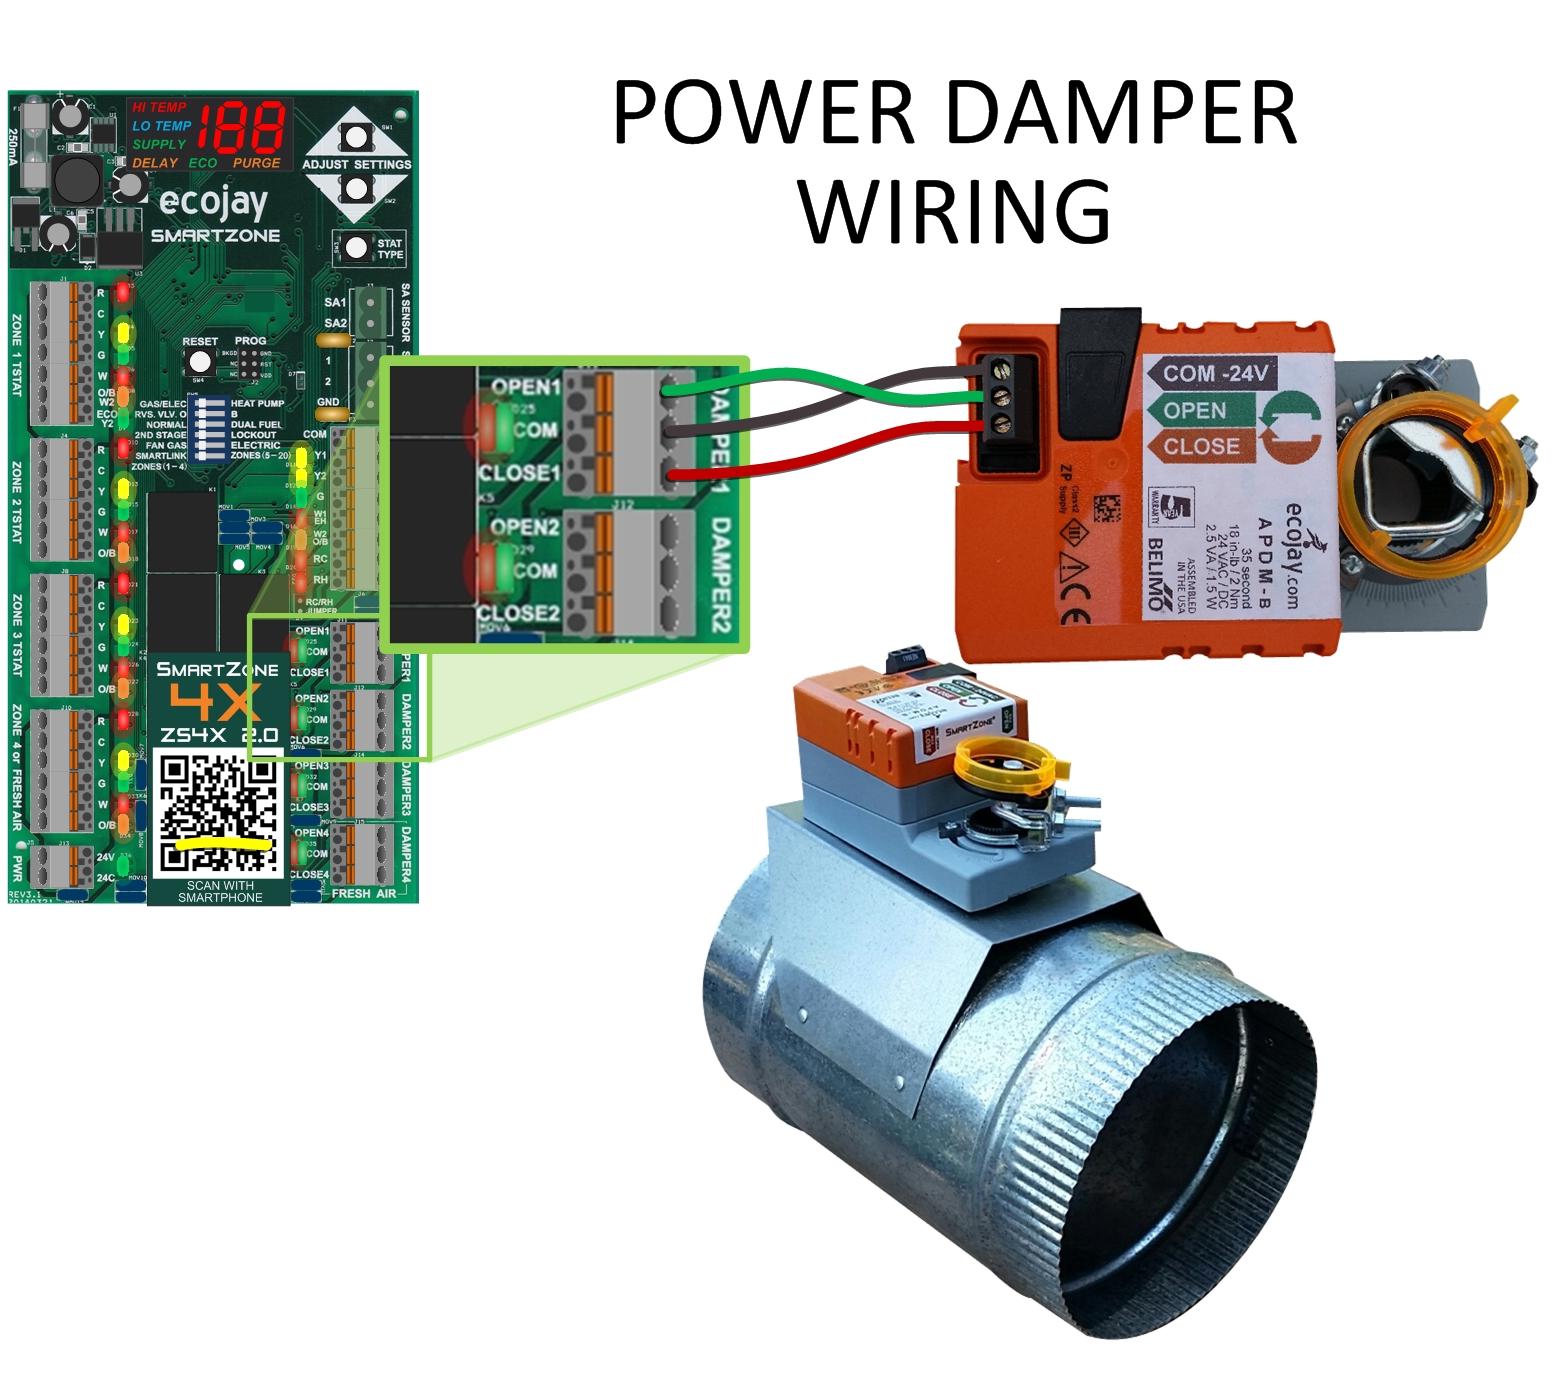 smartzone power open dampers wiring jpg [ 1500 x 1338 Pixel ]